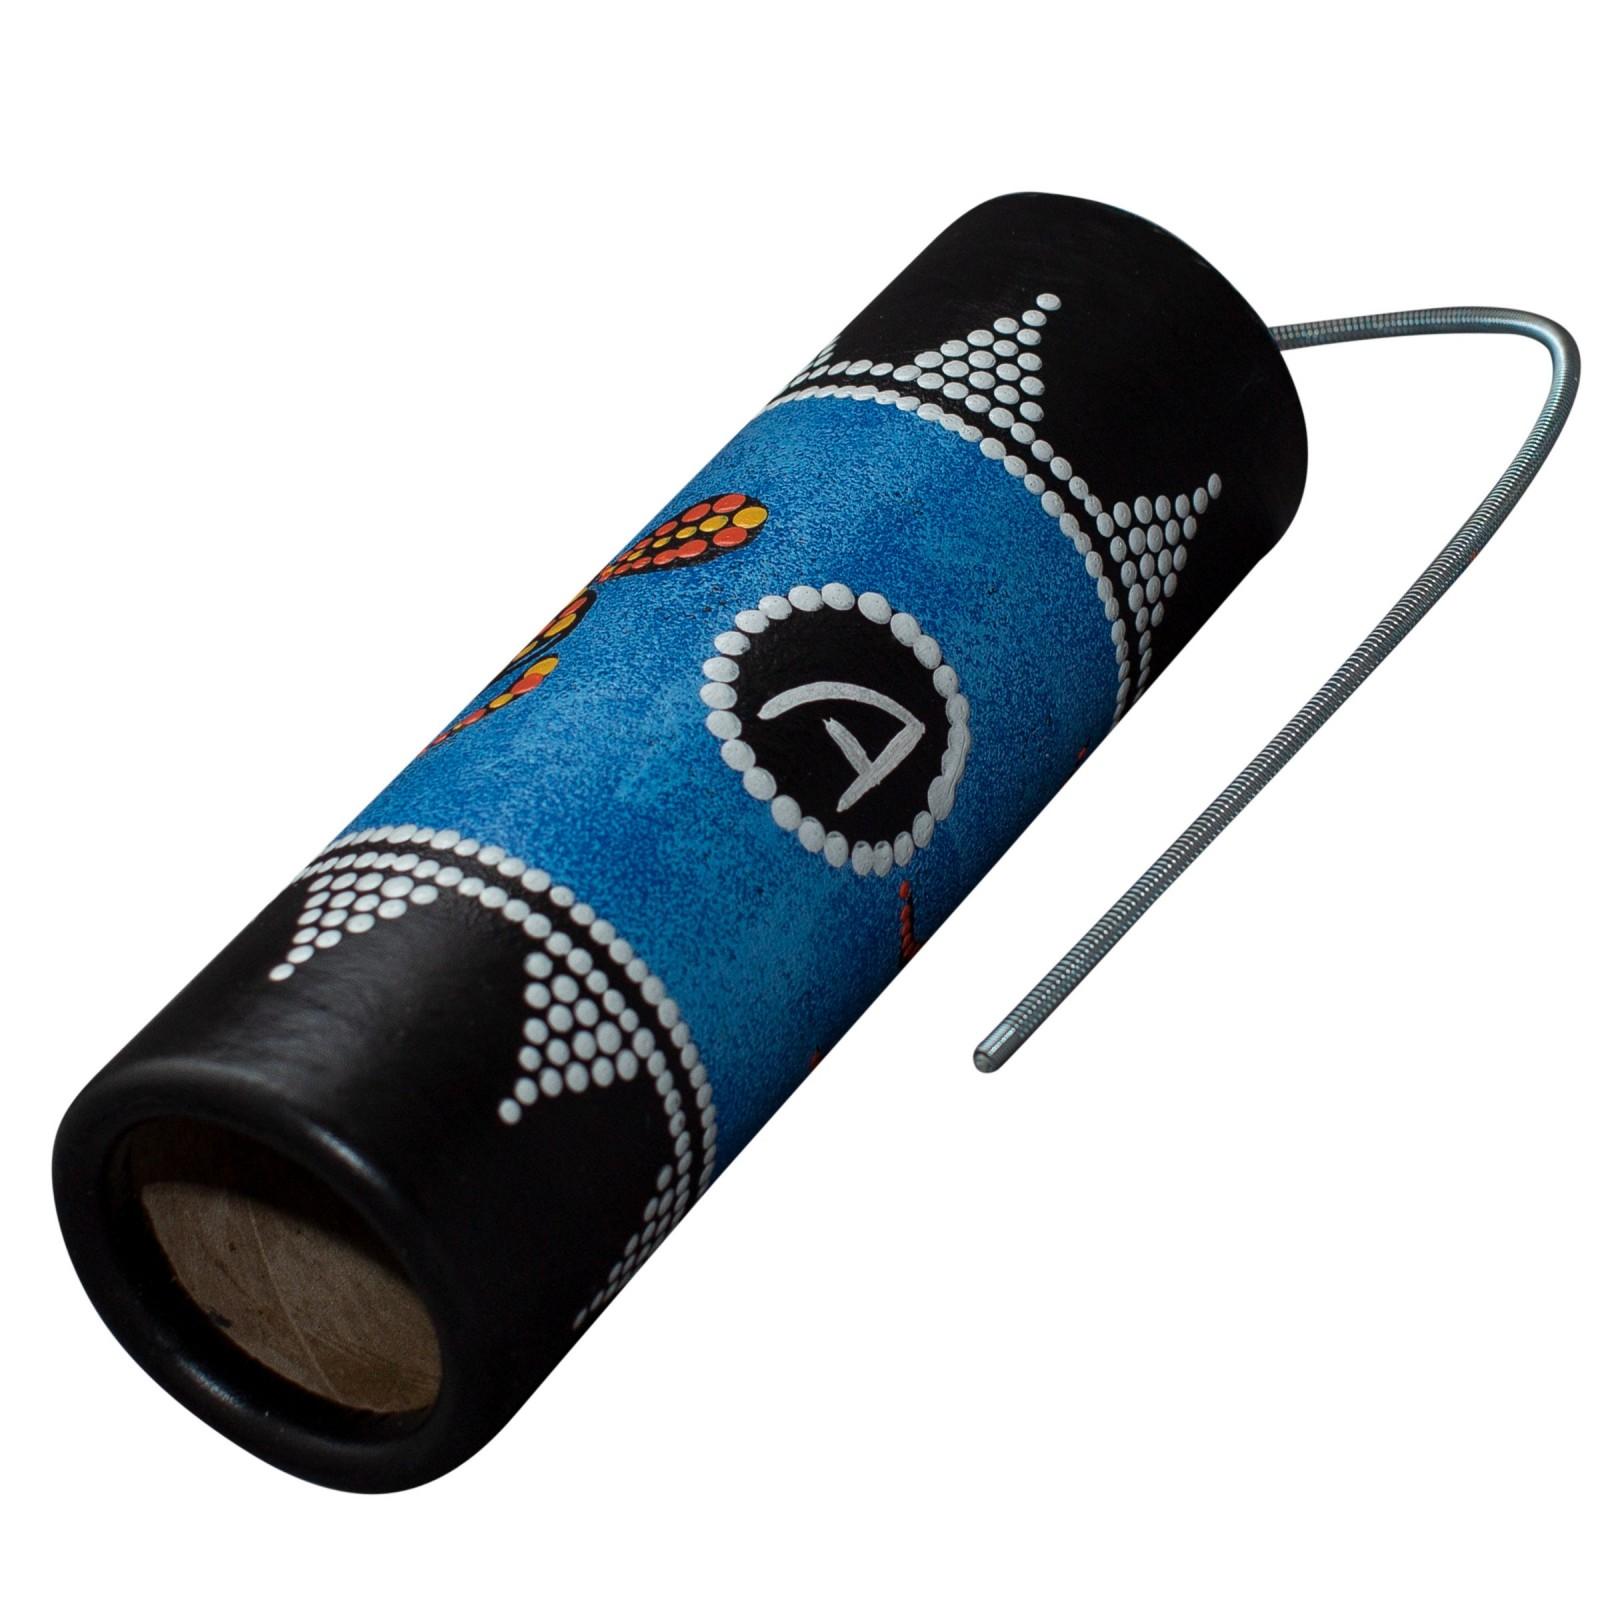 Spring Drum AT- BLTD-25, Thunder Tube – Australian Aboriginal Graphics. 25cm